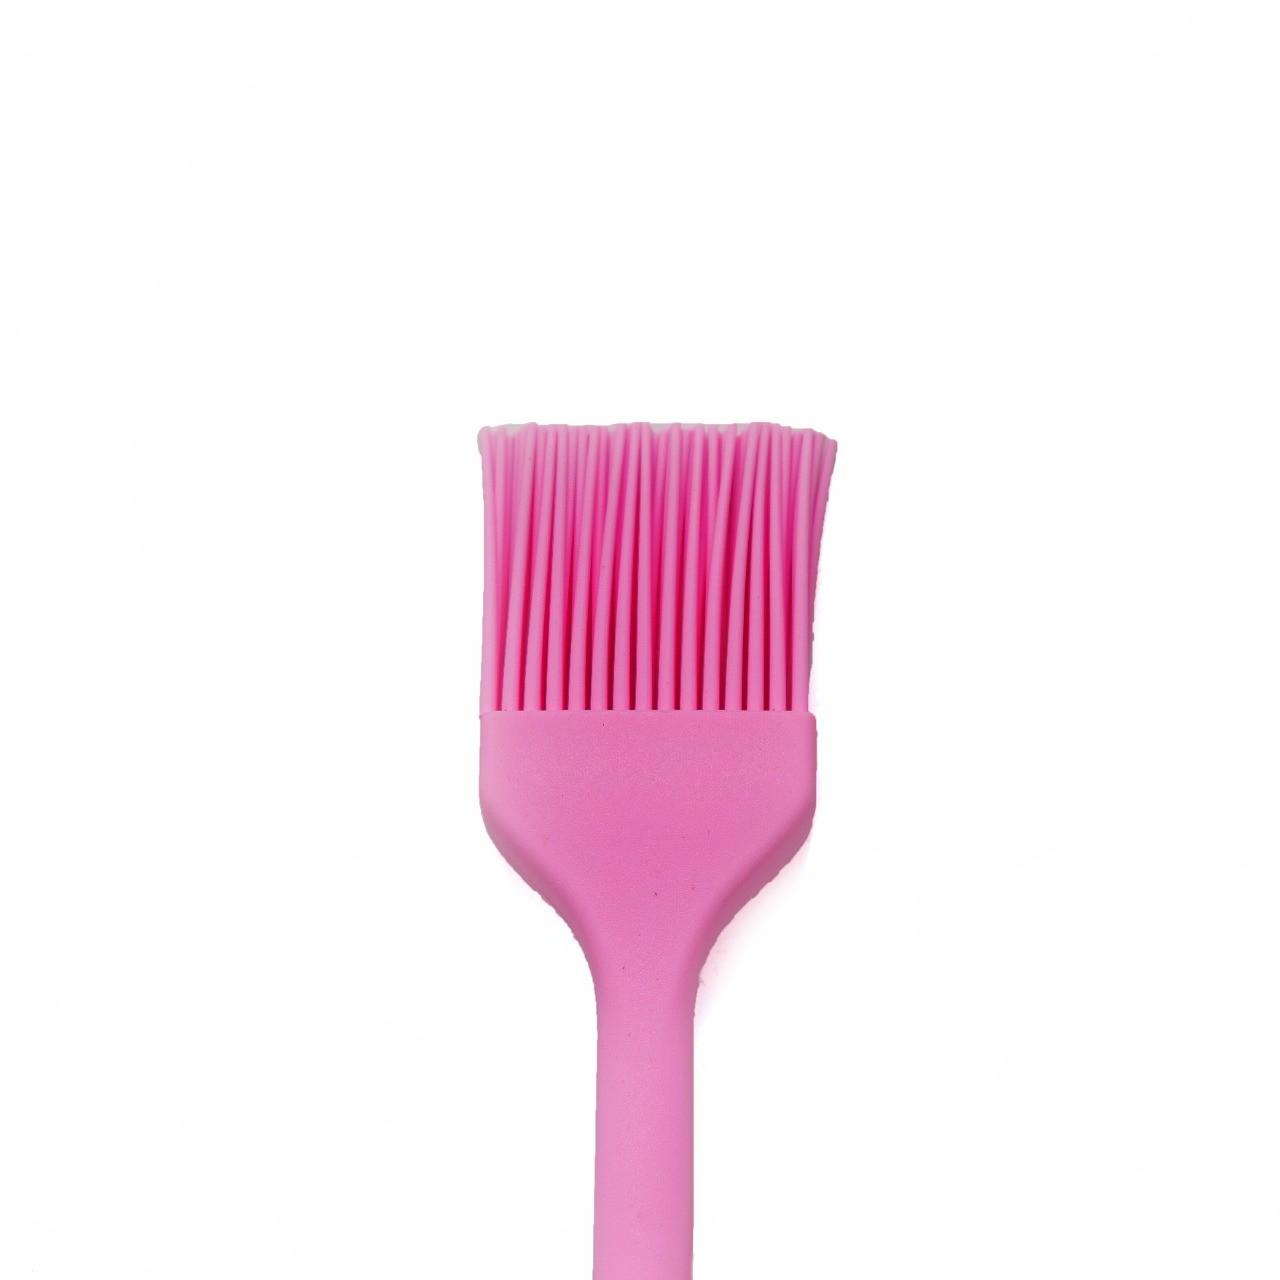 Pincel Cozinha Silicone Rosa Pincelar Carne Massas Untar Forma  -  Mothelucci Loja online